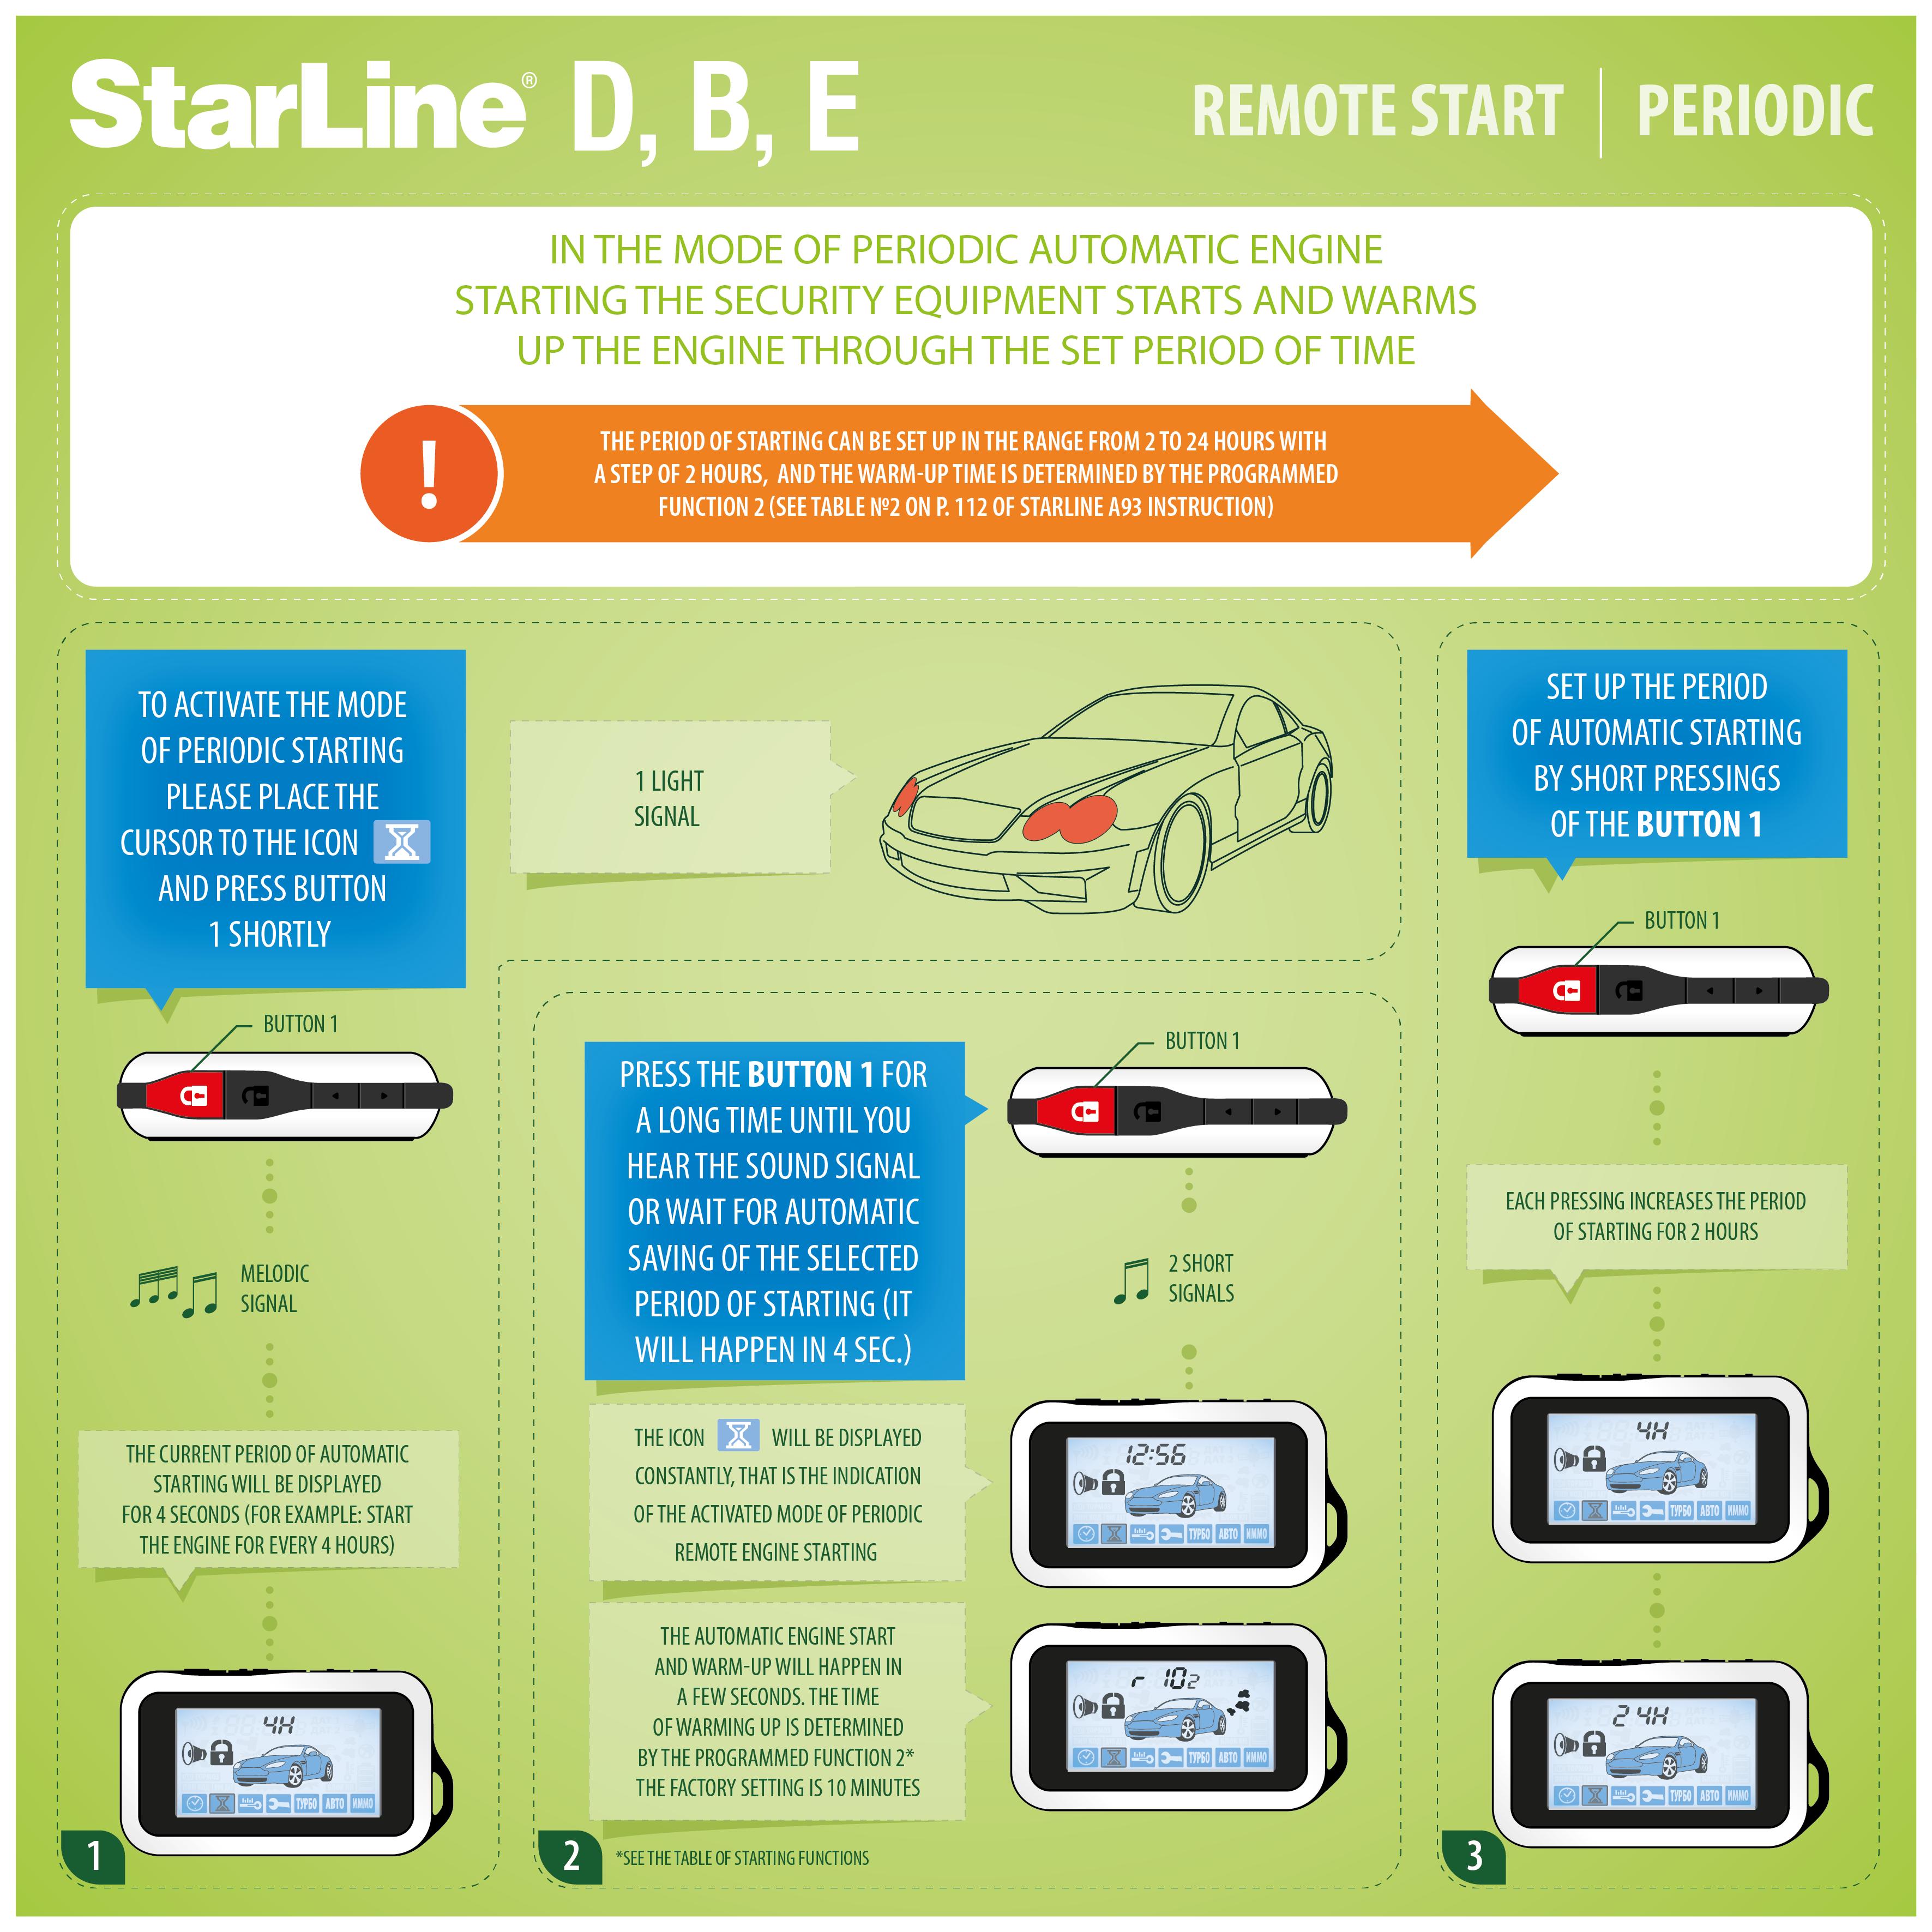 self-start StrLine-E-B-D